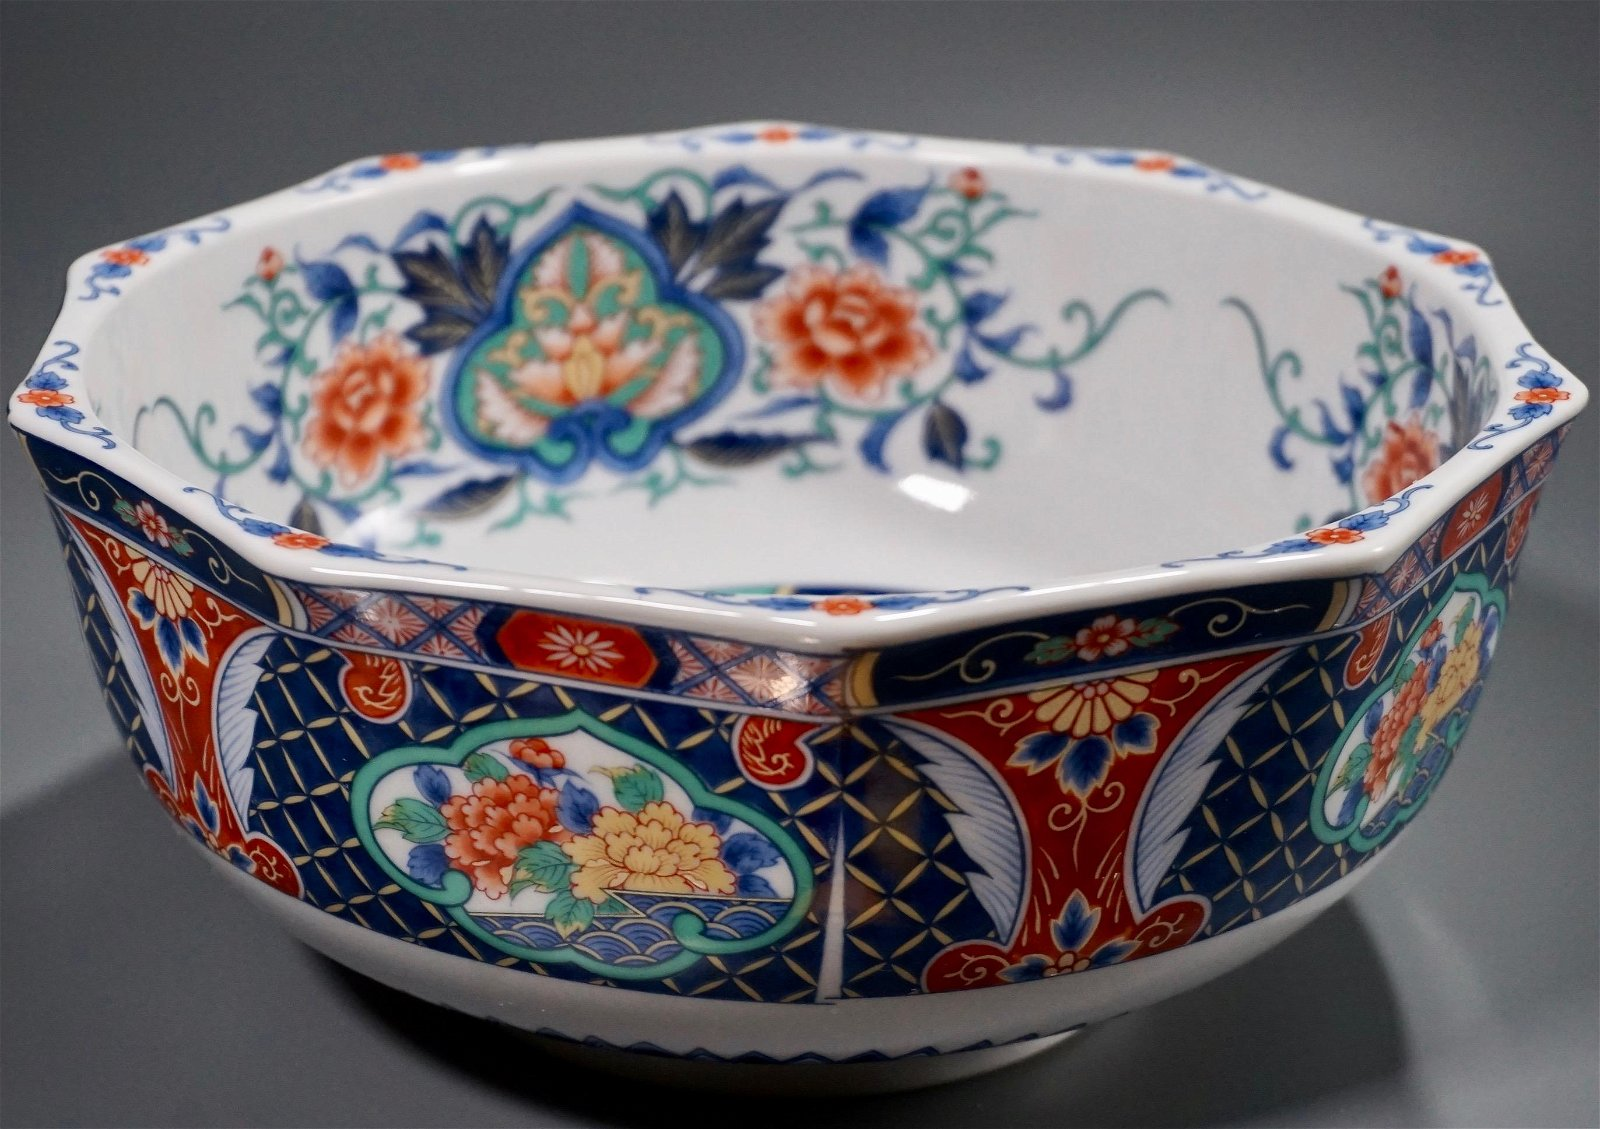 Japanesde Porcelain Bowl Old Stock Unused